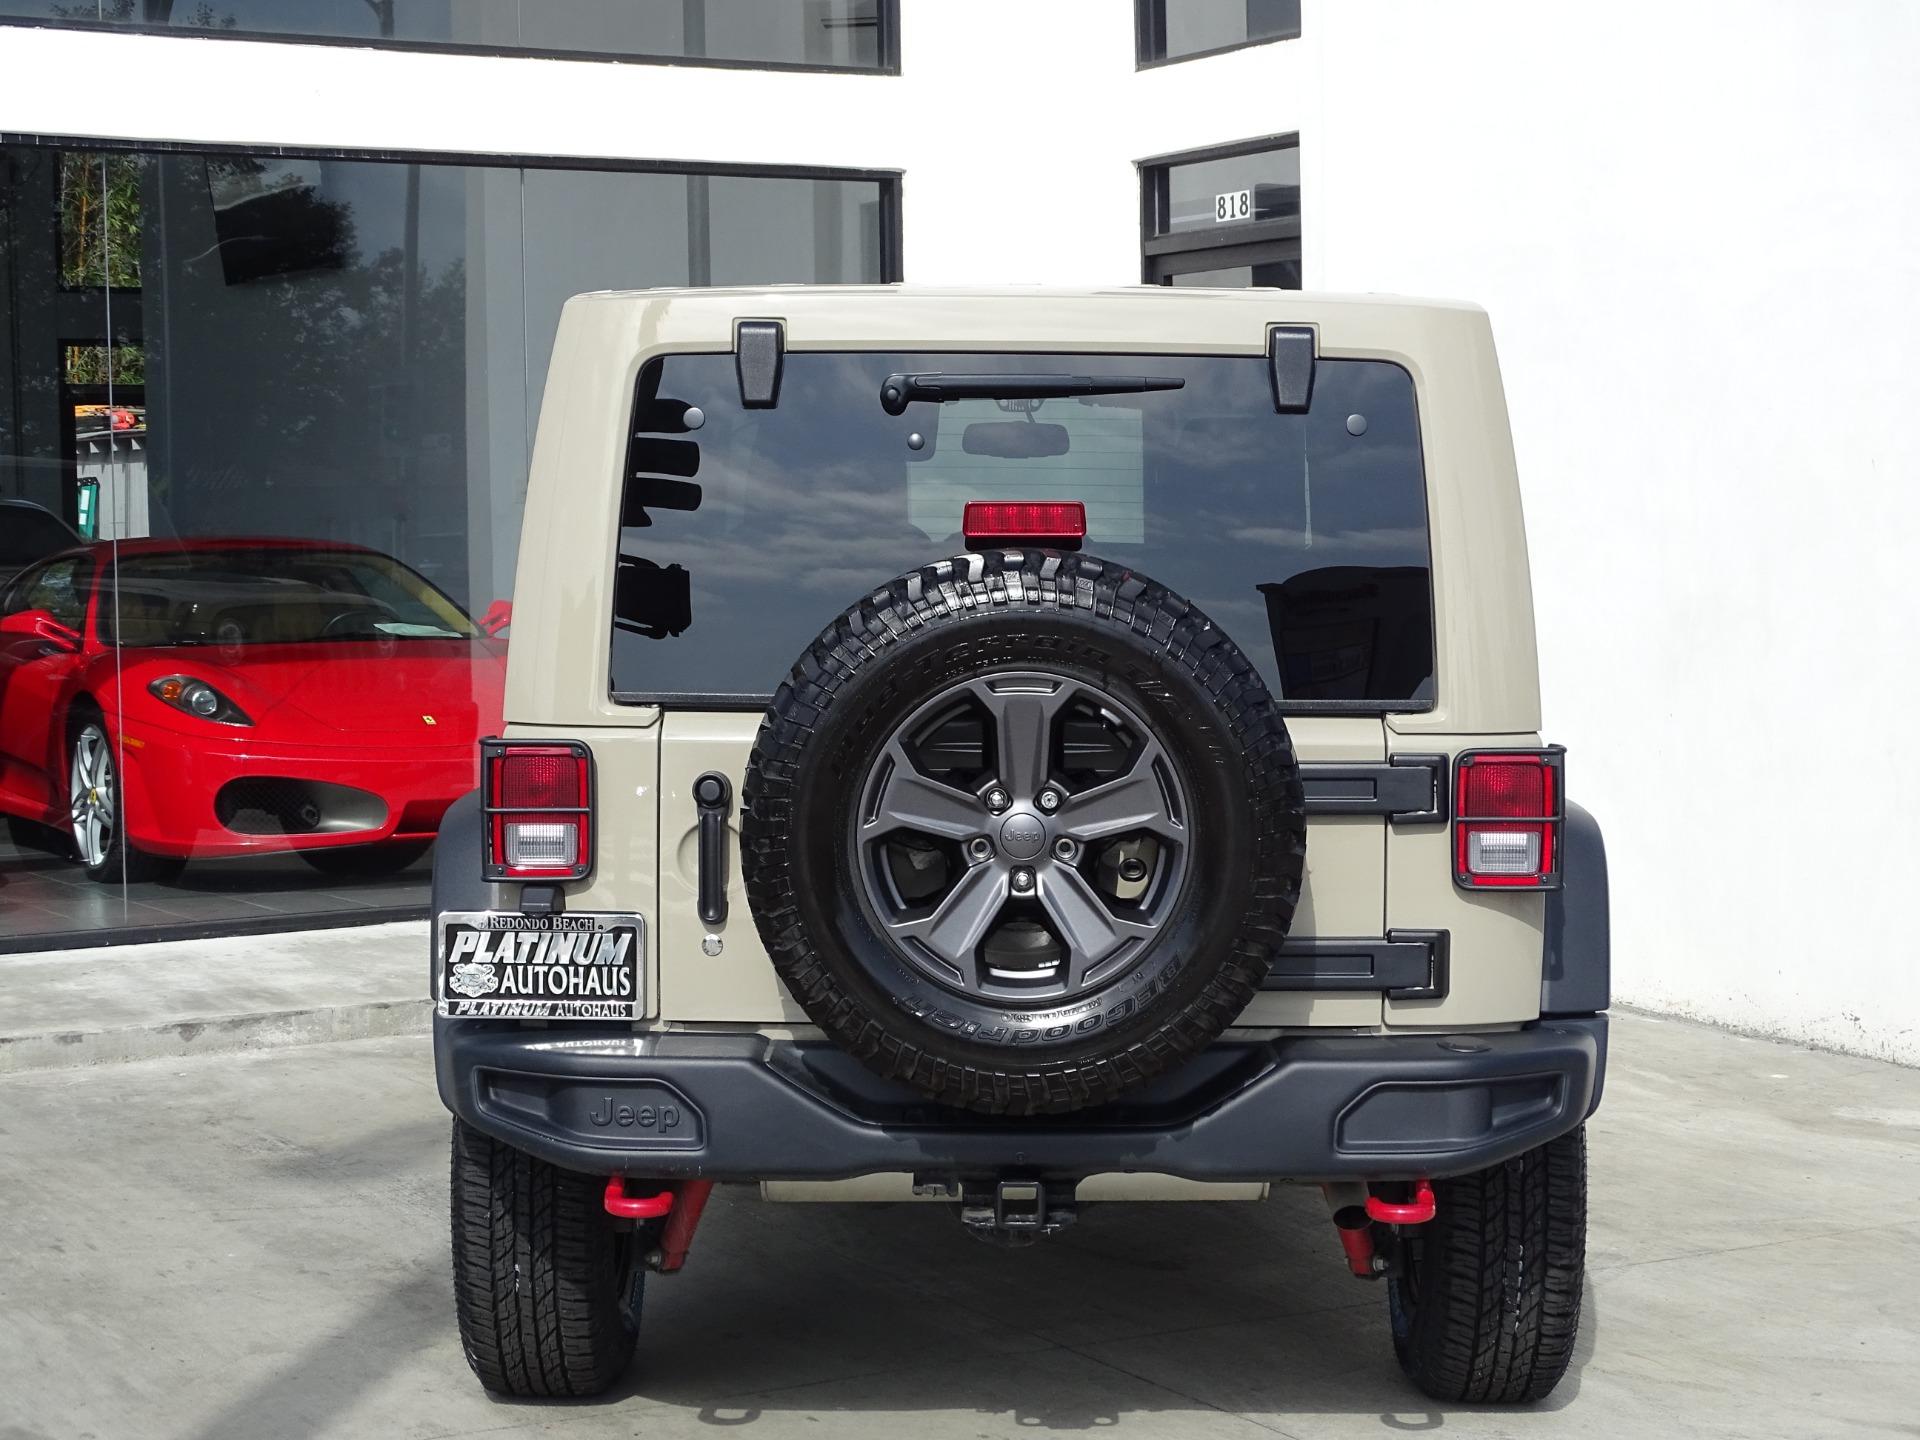 Used-2018-Jeep-Wrangler-Unlimited-Rubicon-Recon